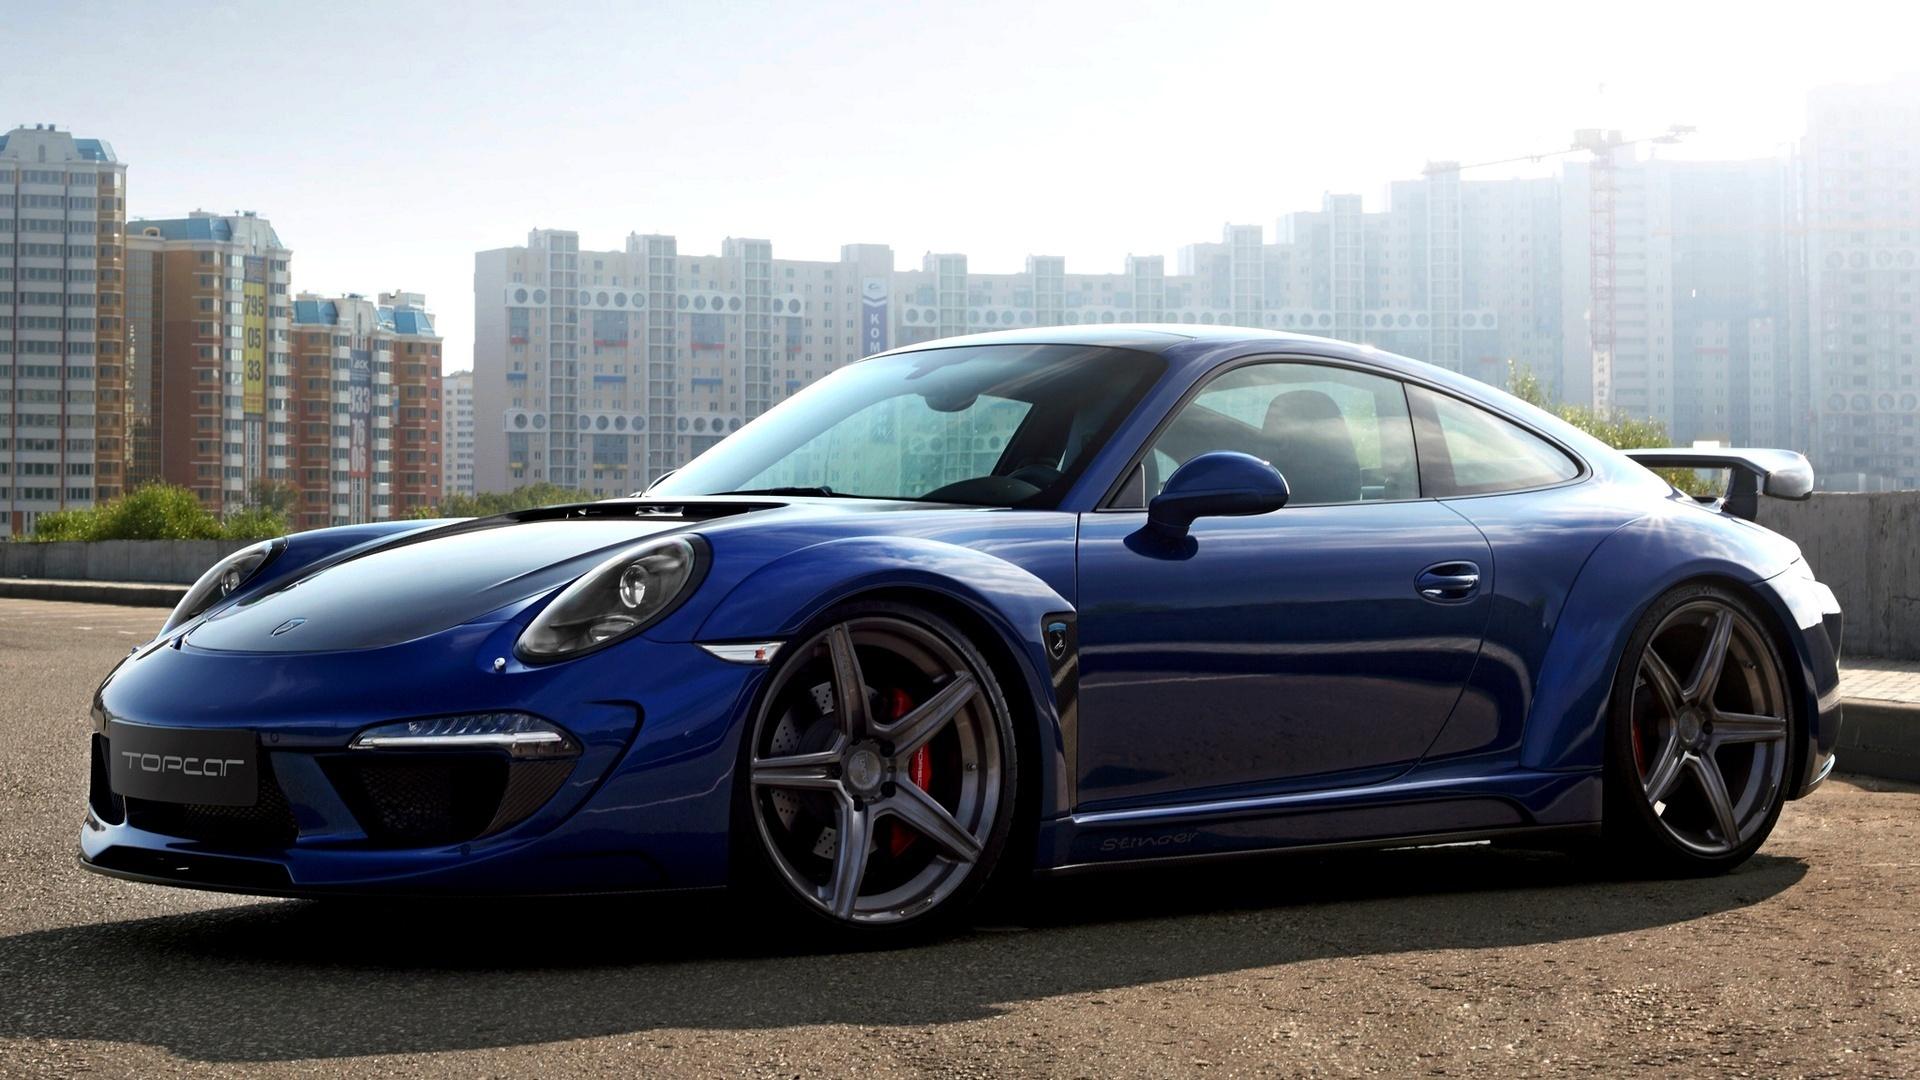 4k Car Wallpaper Koenigsegg Rs Porsche 911 Wallpapers Pictures Images